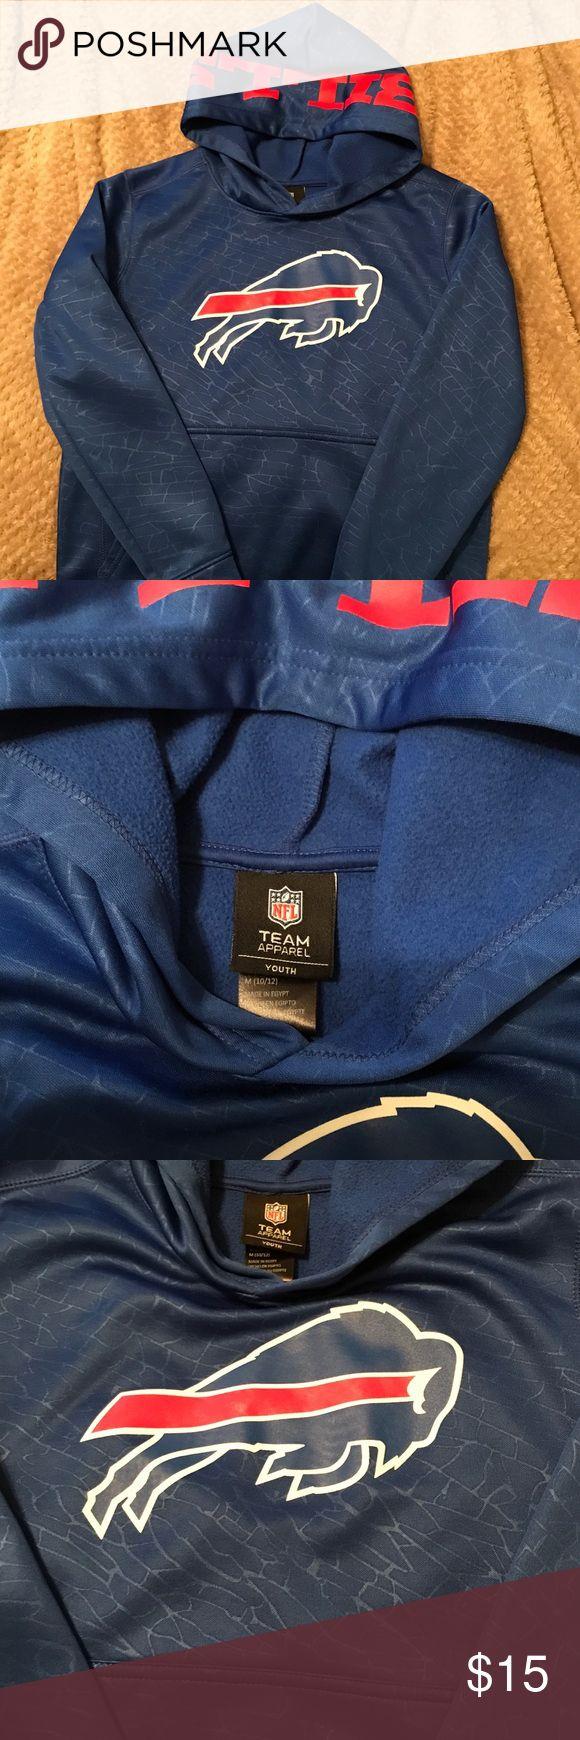 Buffalo Bills sweatshirt Like new . no stains NFL Shirts & Tops Sweatshirts & Hoodies